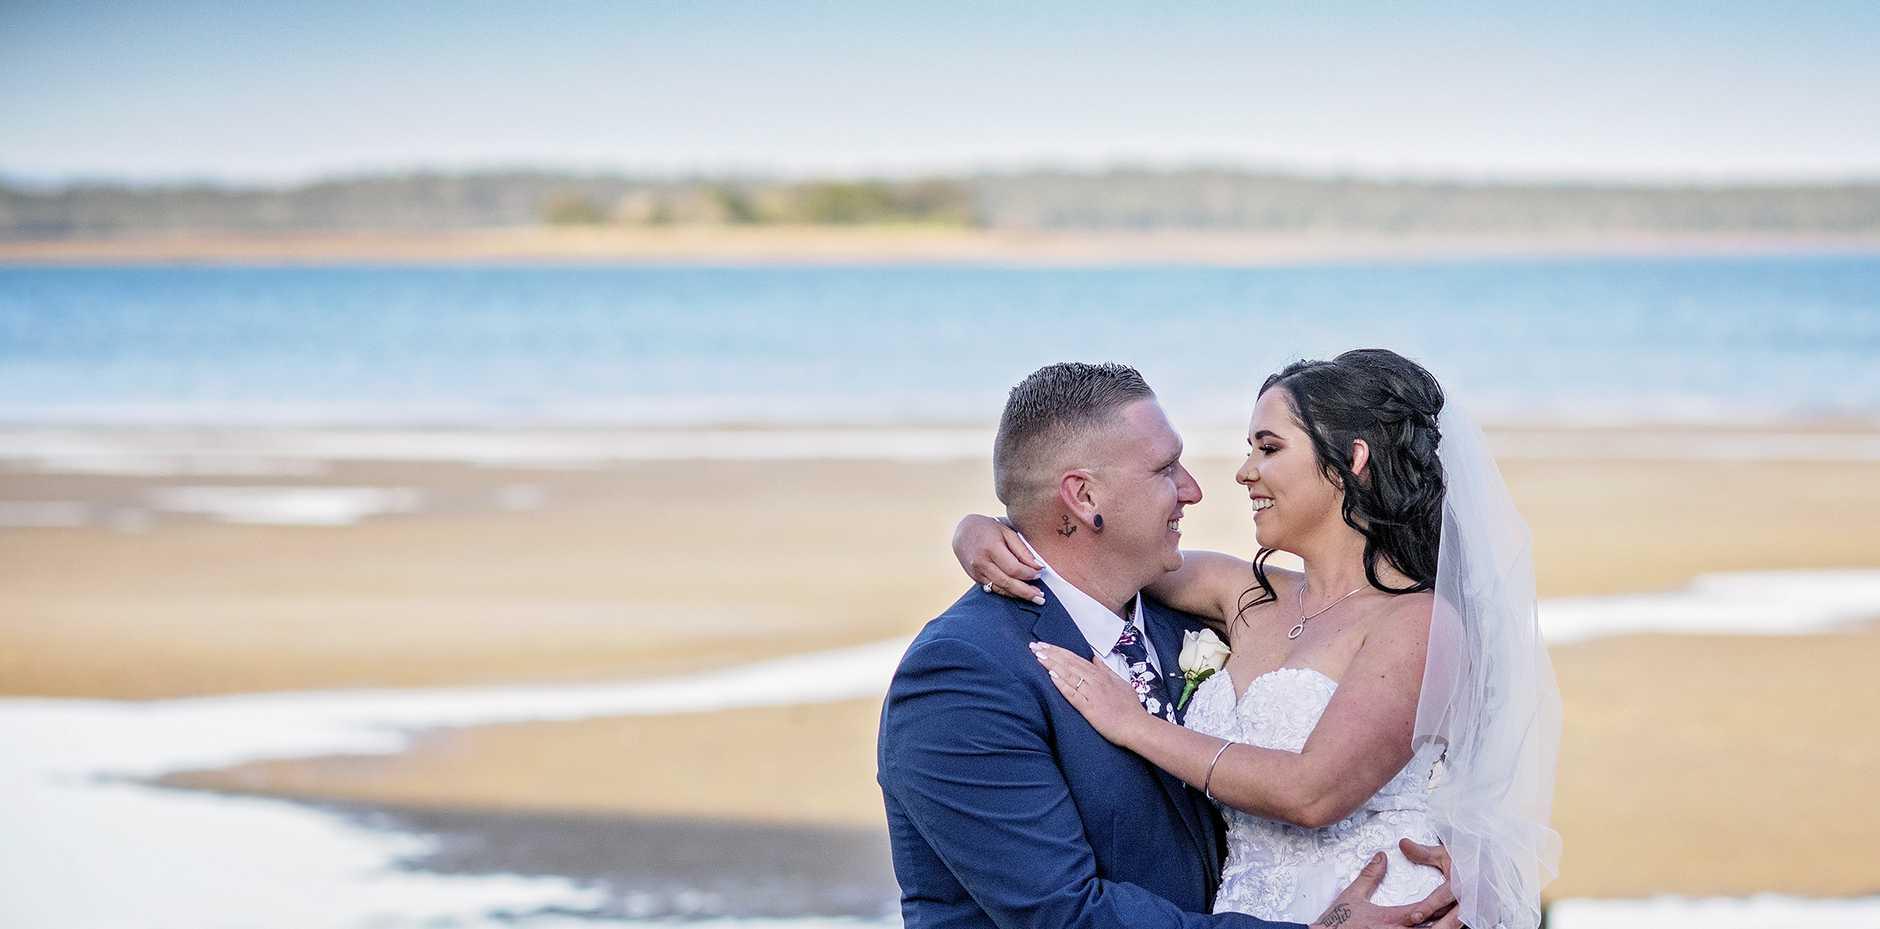 Cassie Simpson wed her husband Josh on August 22 in Hervey Bay.